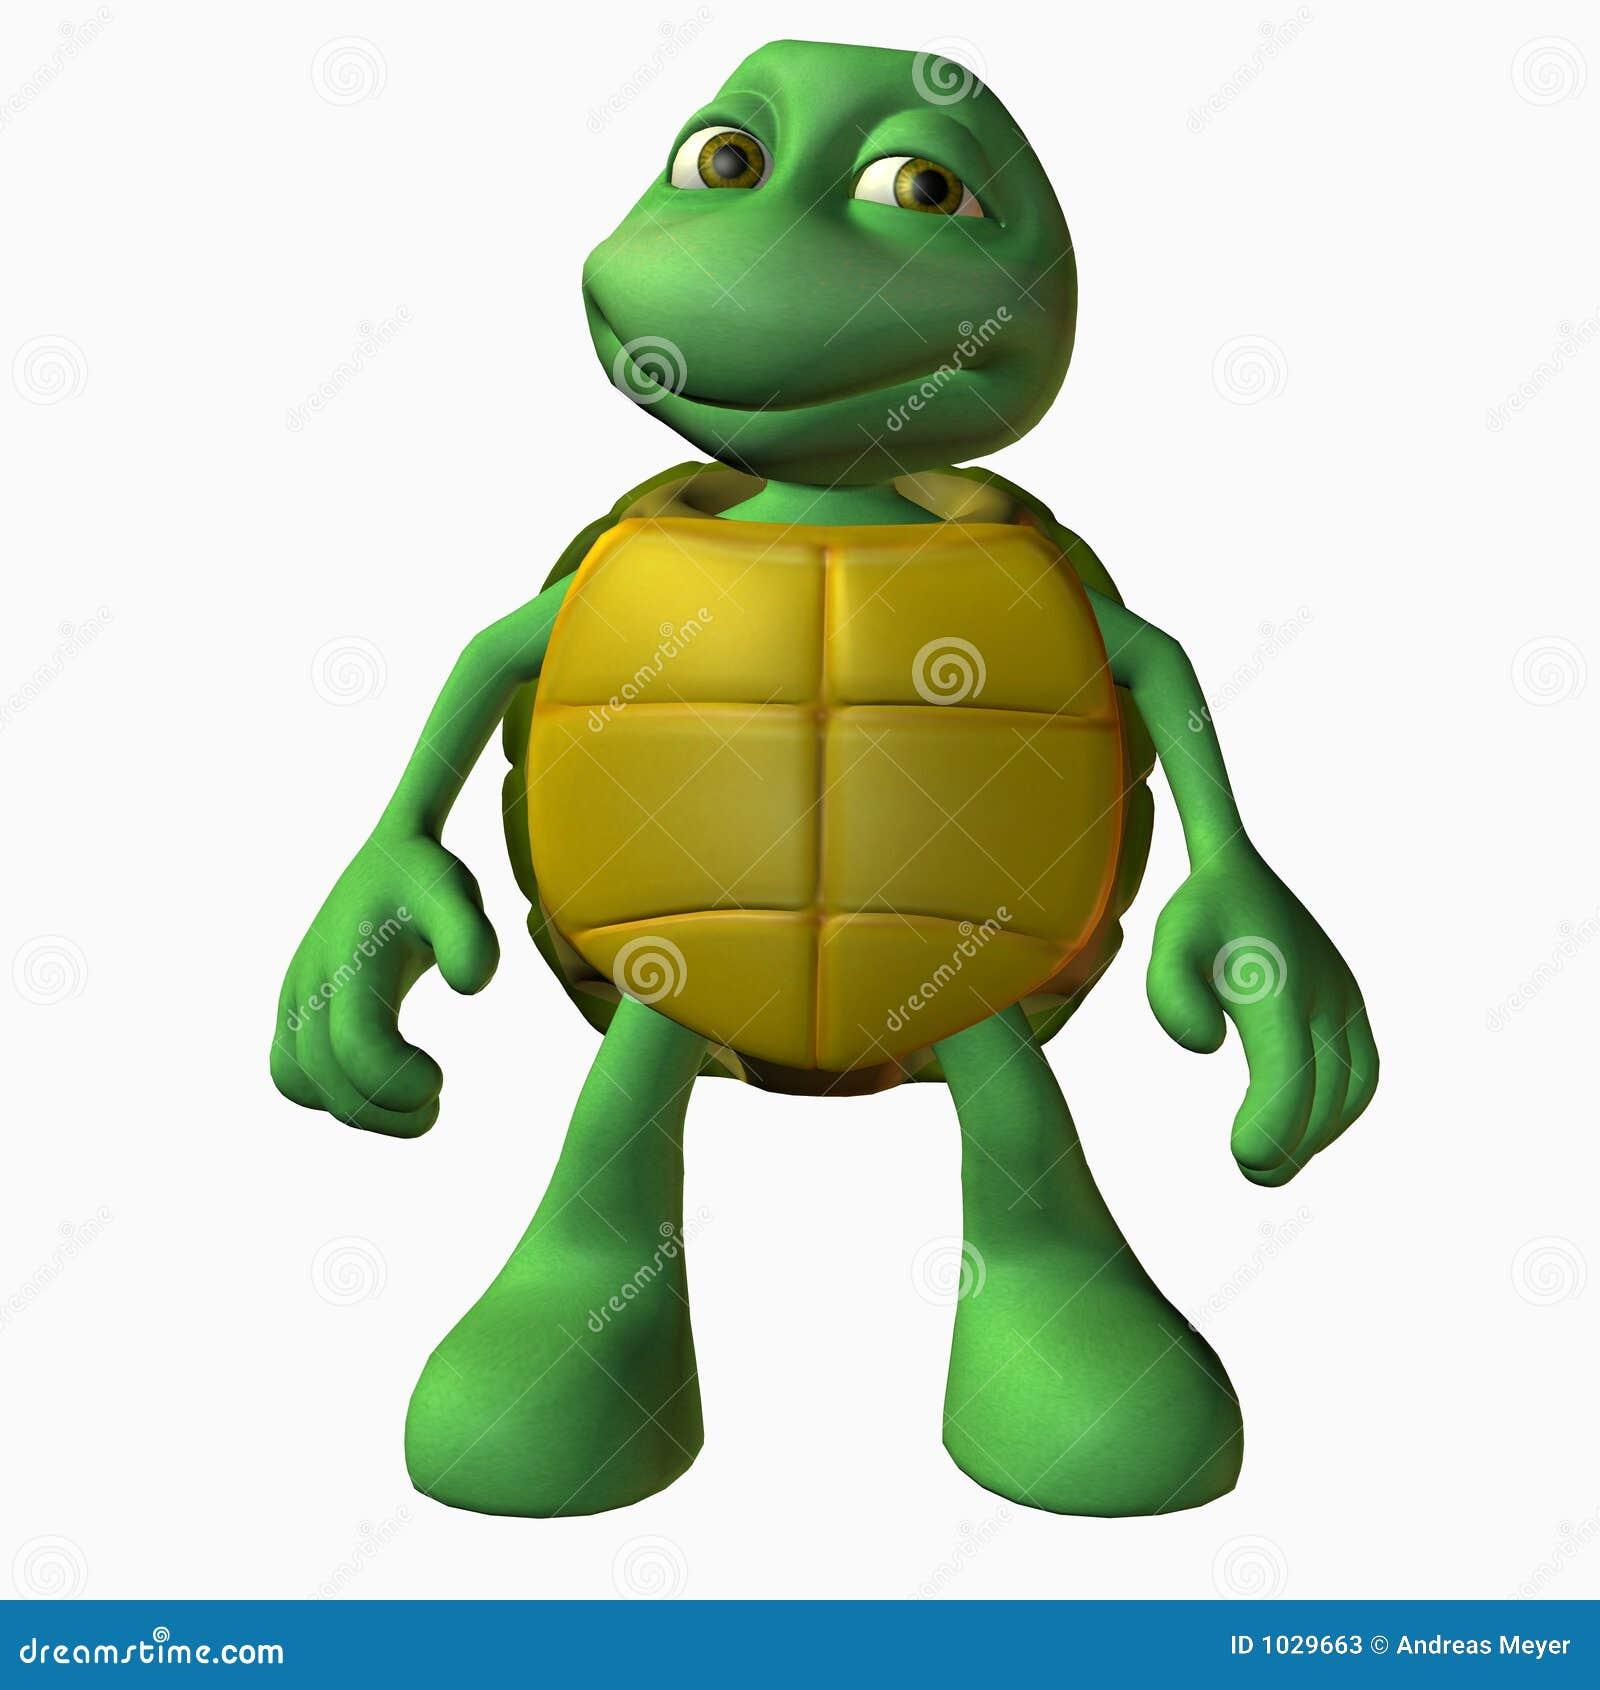 turtle boy -standing stock photos